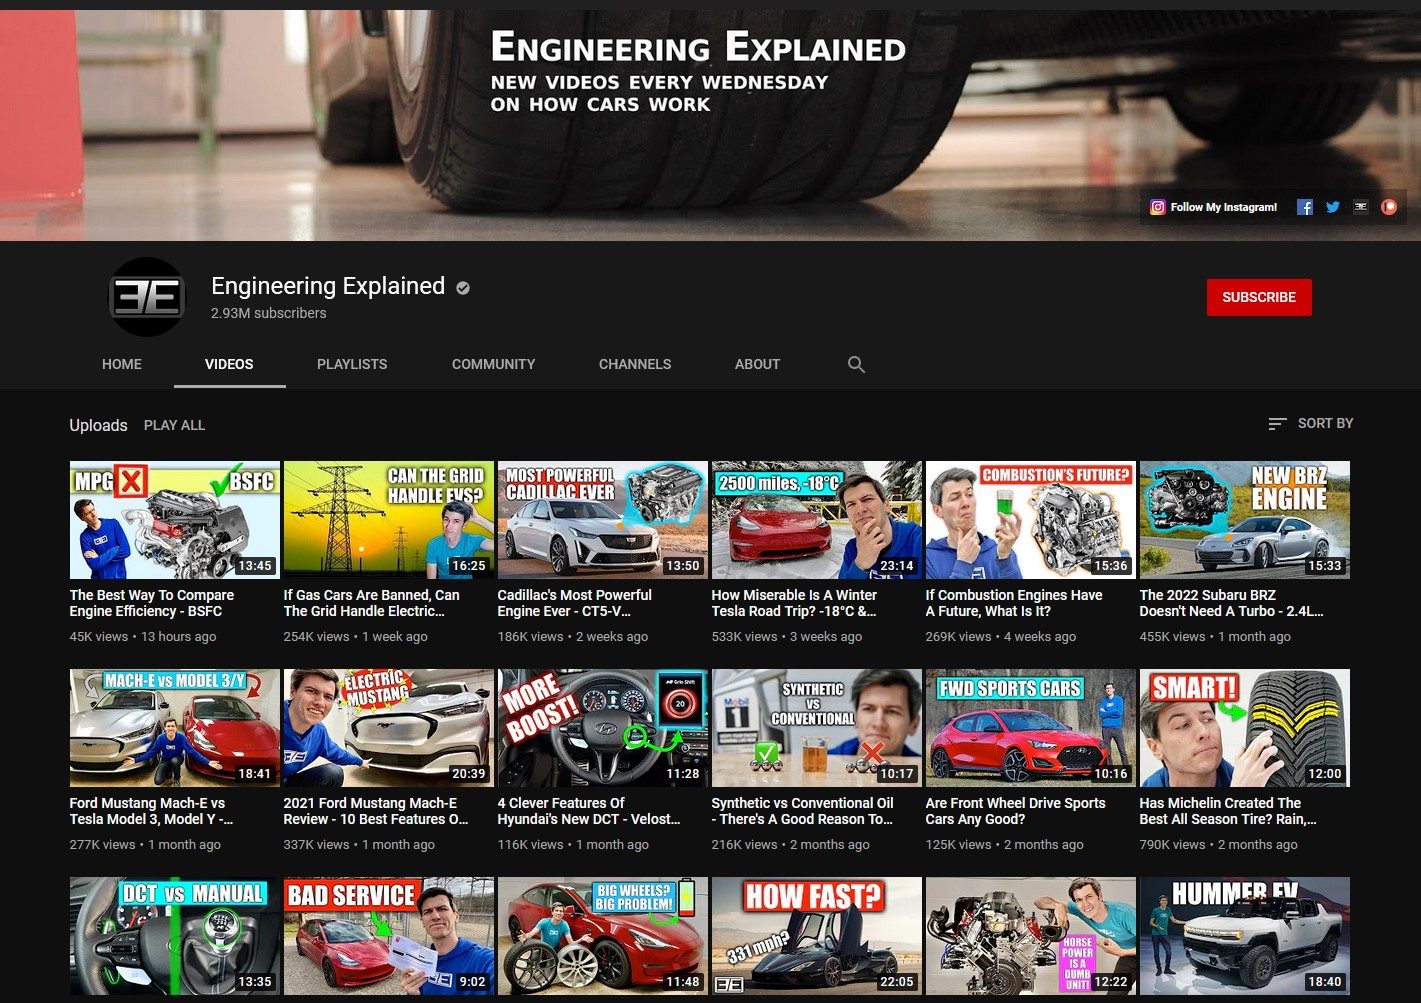 Engineering Explained